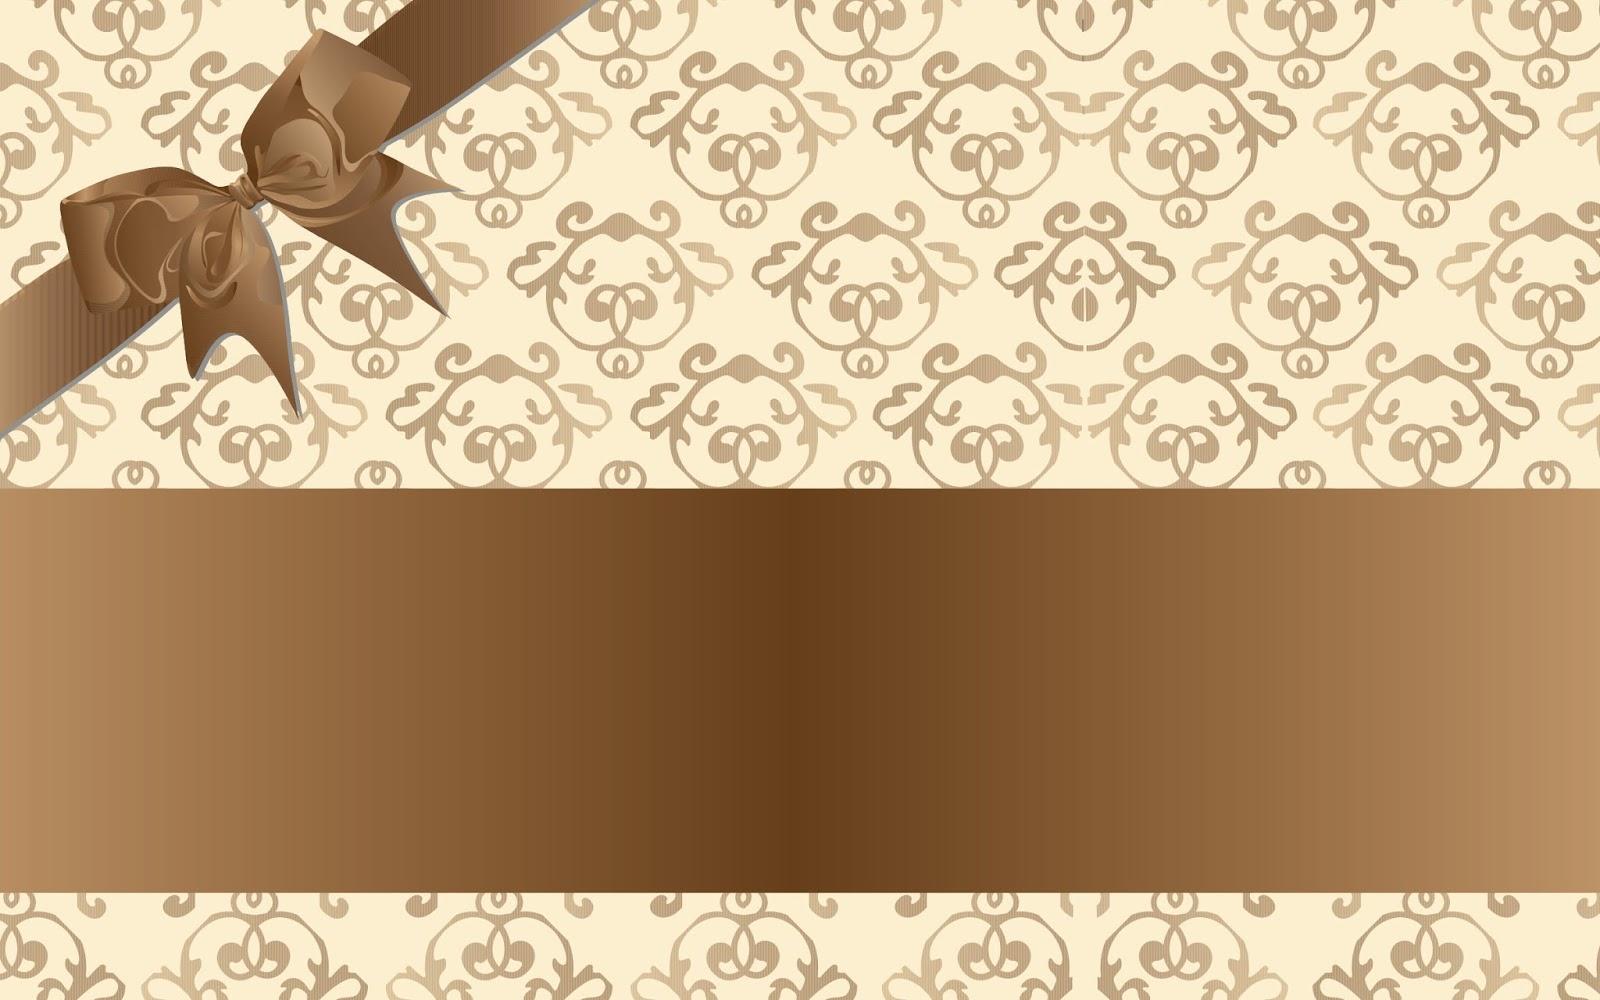 Design World Invitation Card Design Vickie S Blog Mafia War